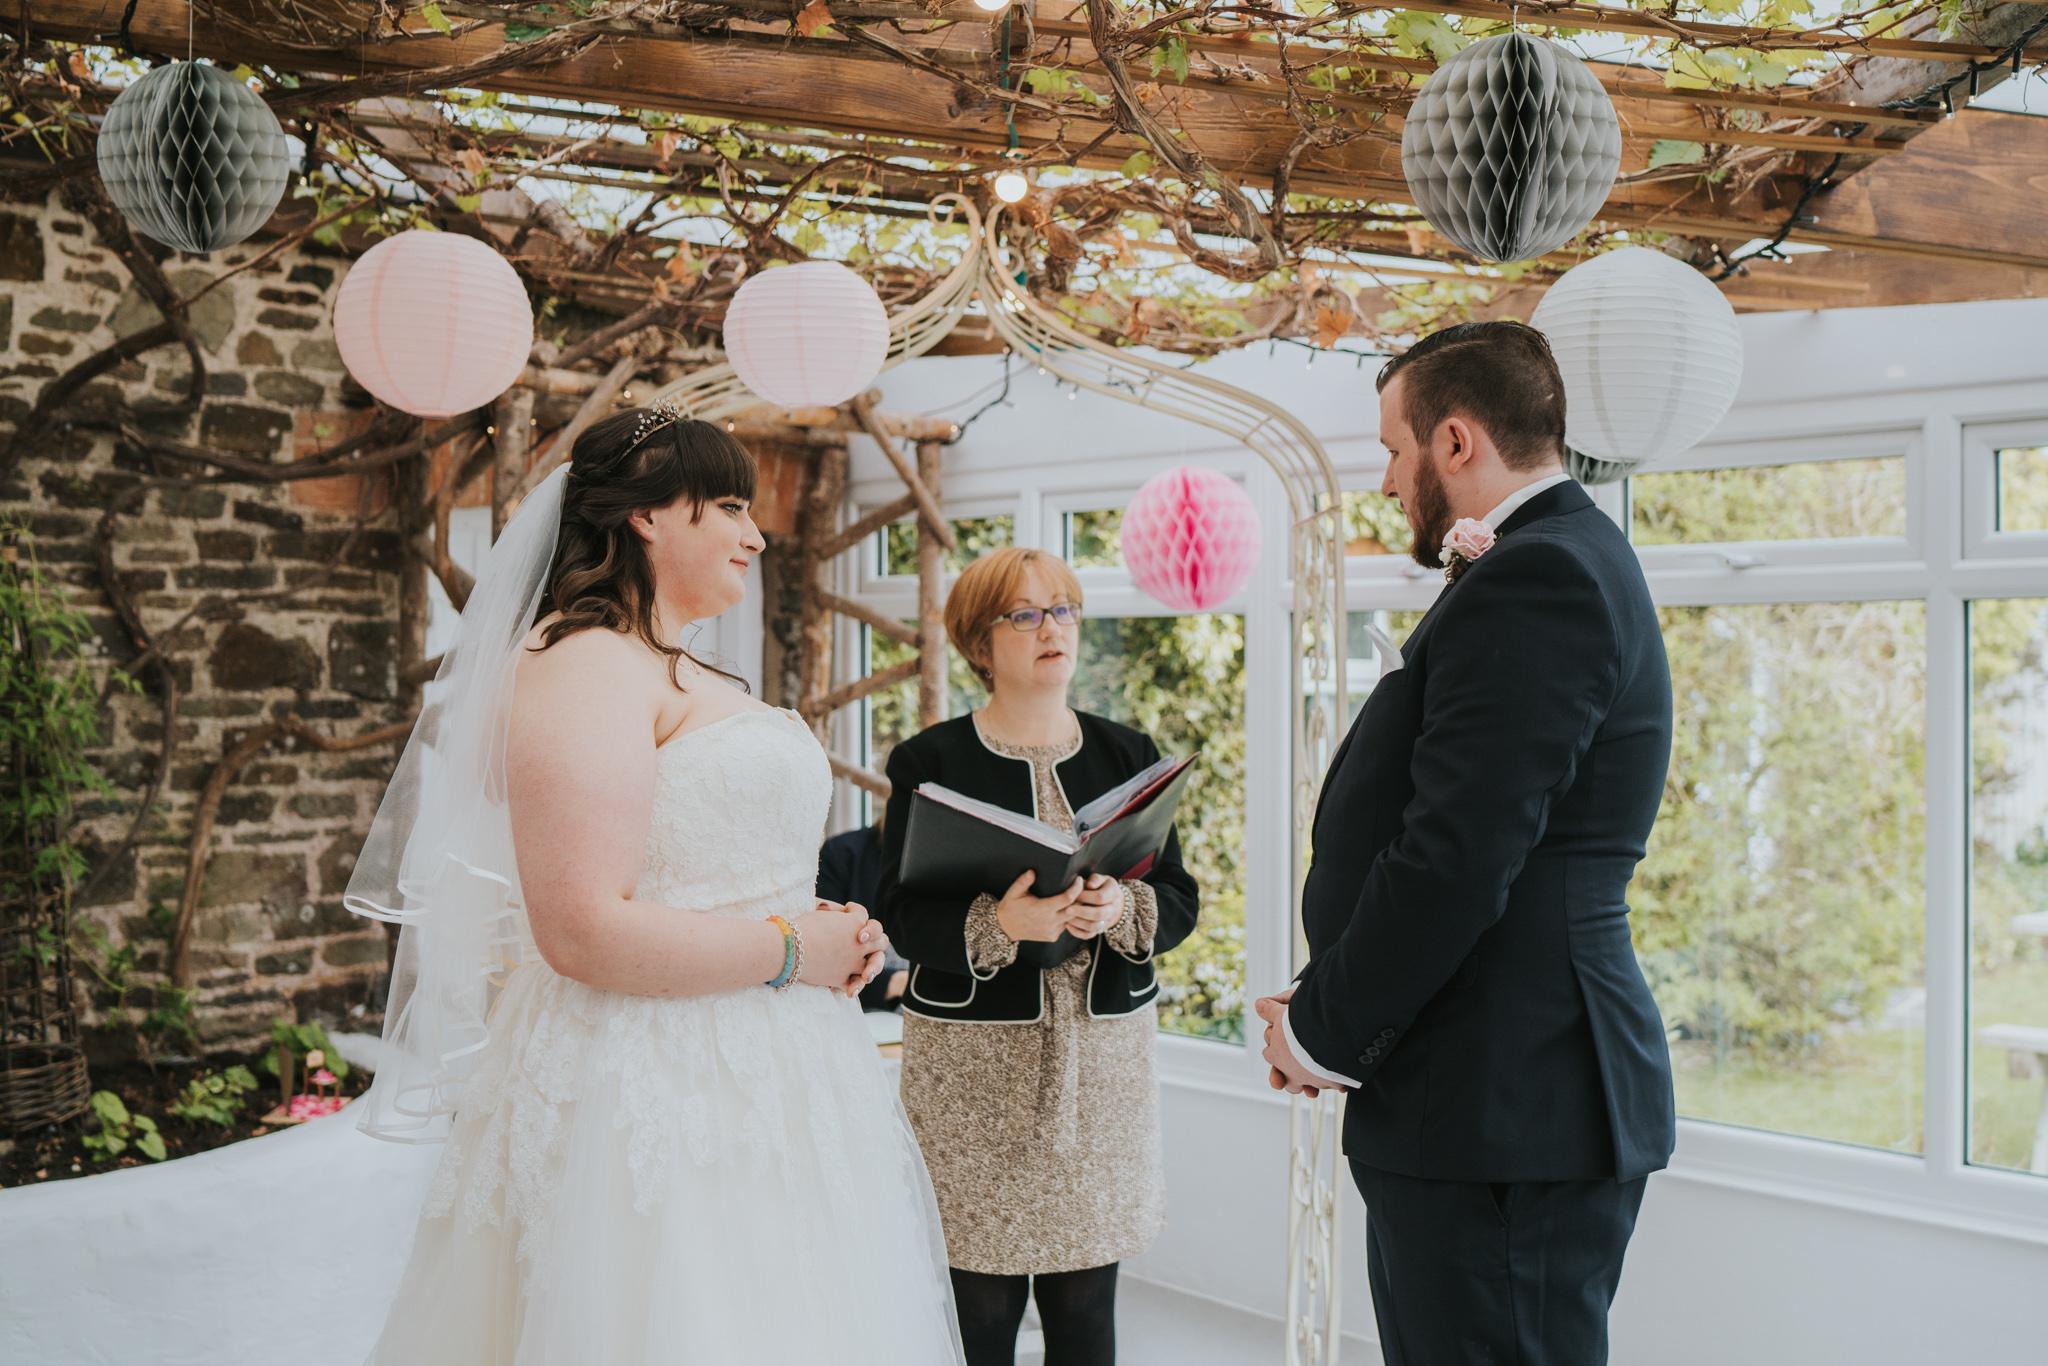 grace-sam-old-barn-clovelly-devon-wedding-photographer-grace-elizabeth-essex-suffolk-norfolk-wedding-photographer (55 of 132).jpg